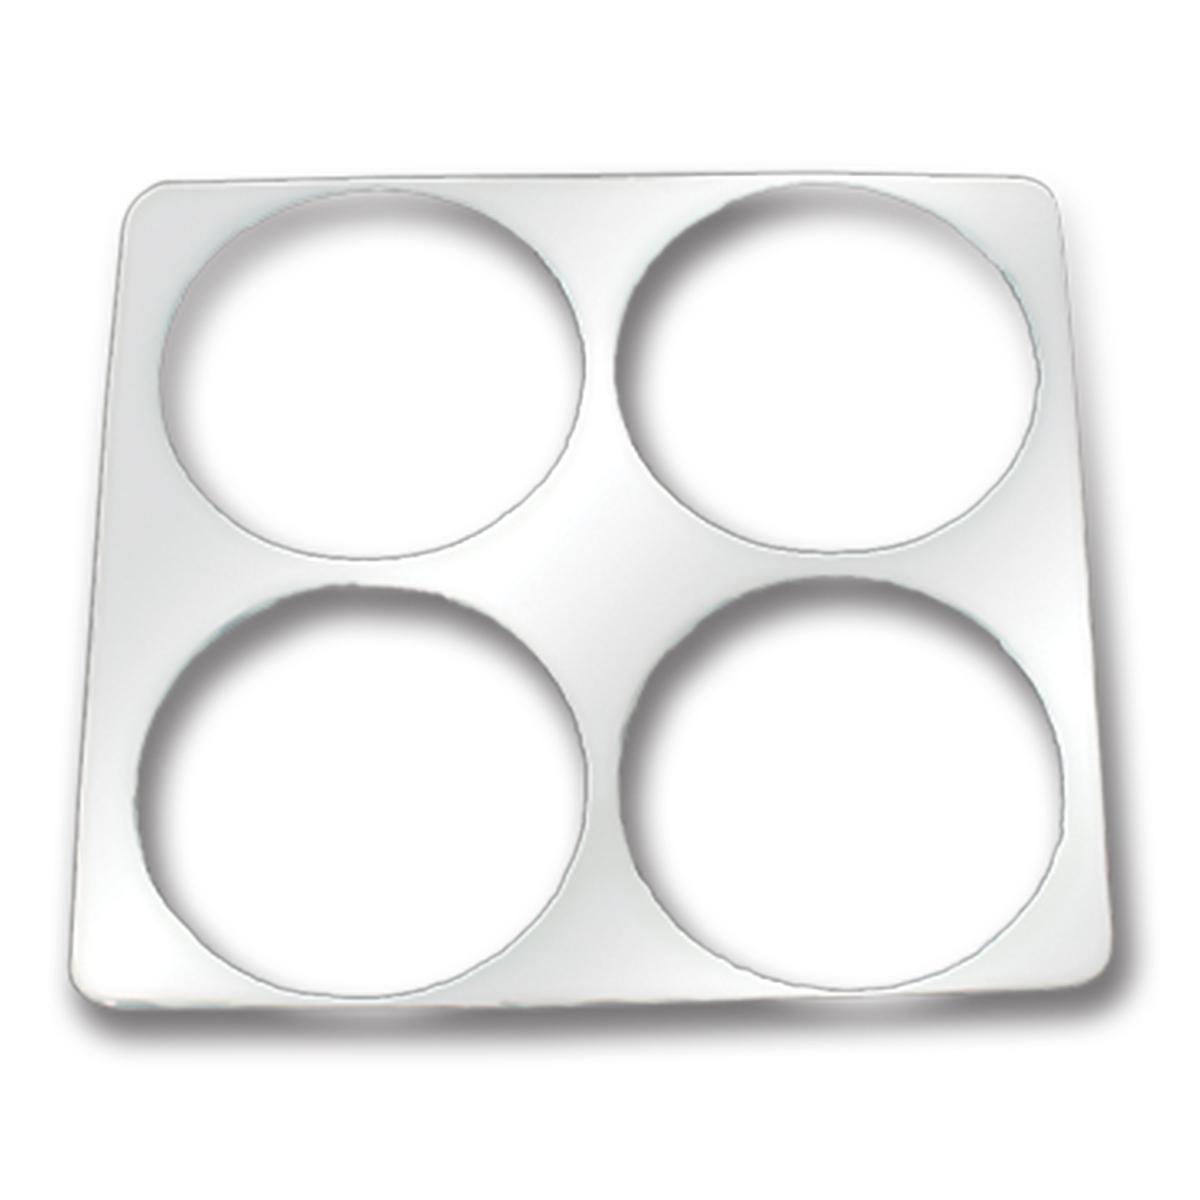 68910 KW Chrome Soft Plastic Left Gauge Trim